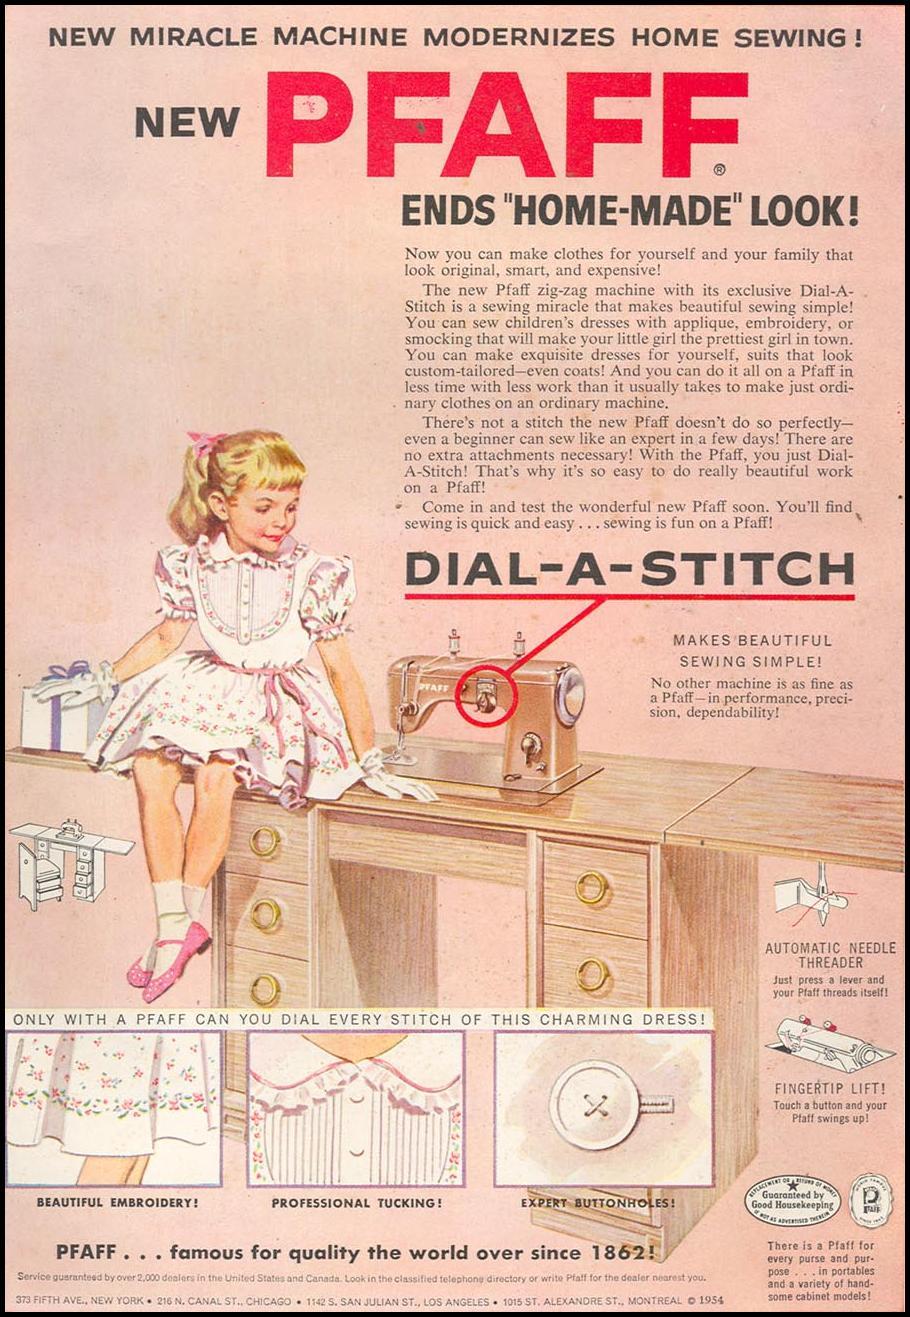 PFAFF SEWING MACHINES WOMAN'S DAY 10/01/1954 INSIDE BACK